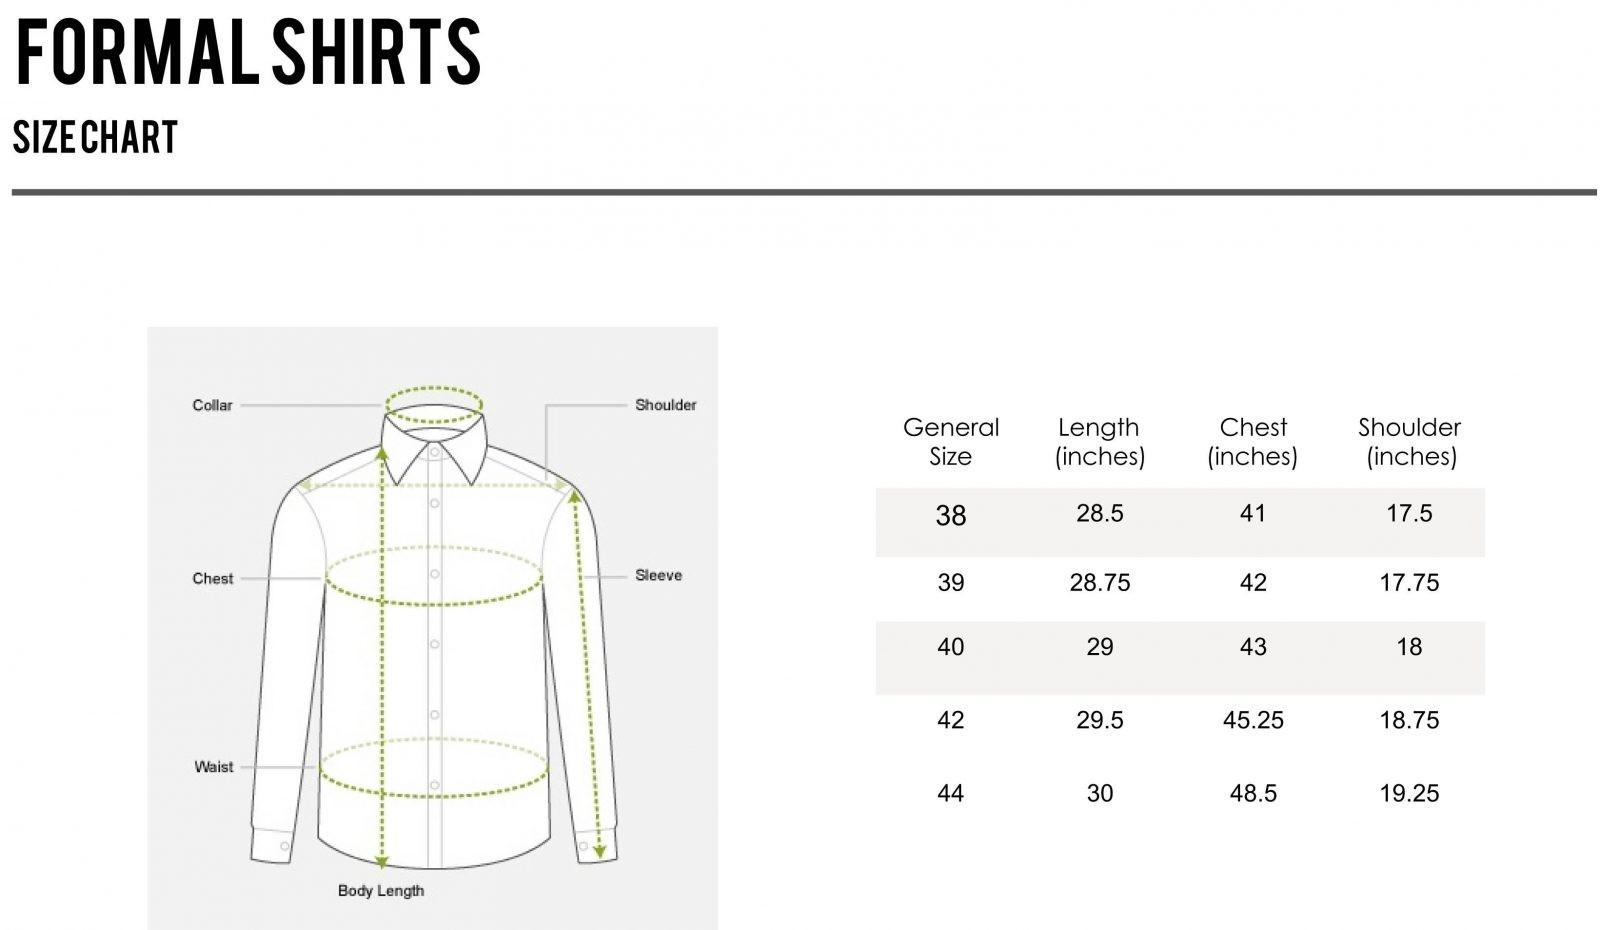 Configuring a shirt